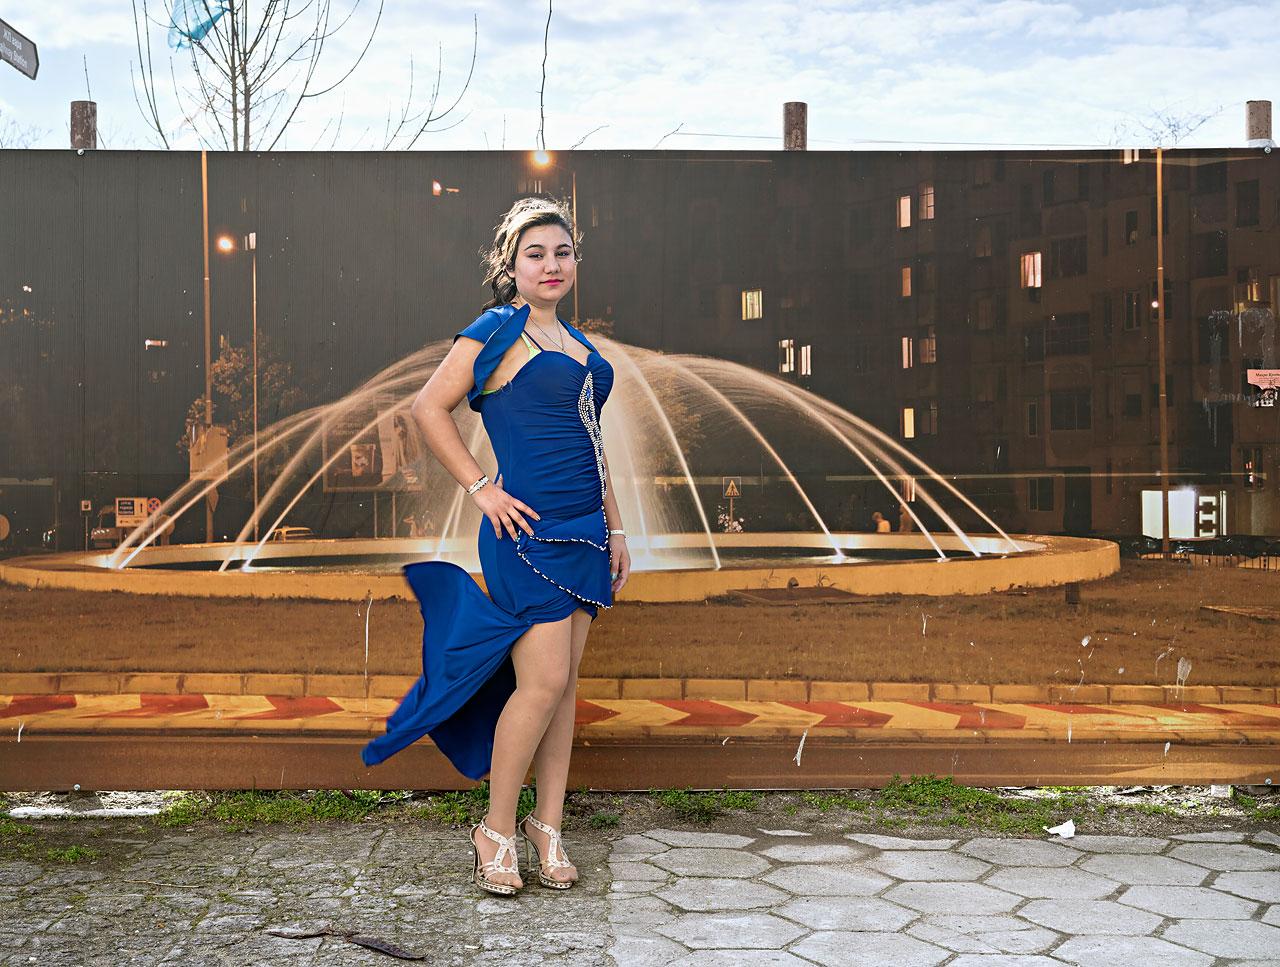 Pepa Hristova - The Bartered Bride - Felix Schoeller Photoaward